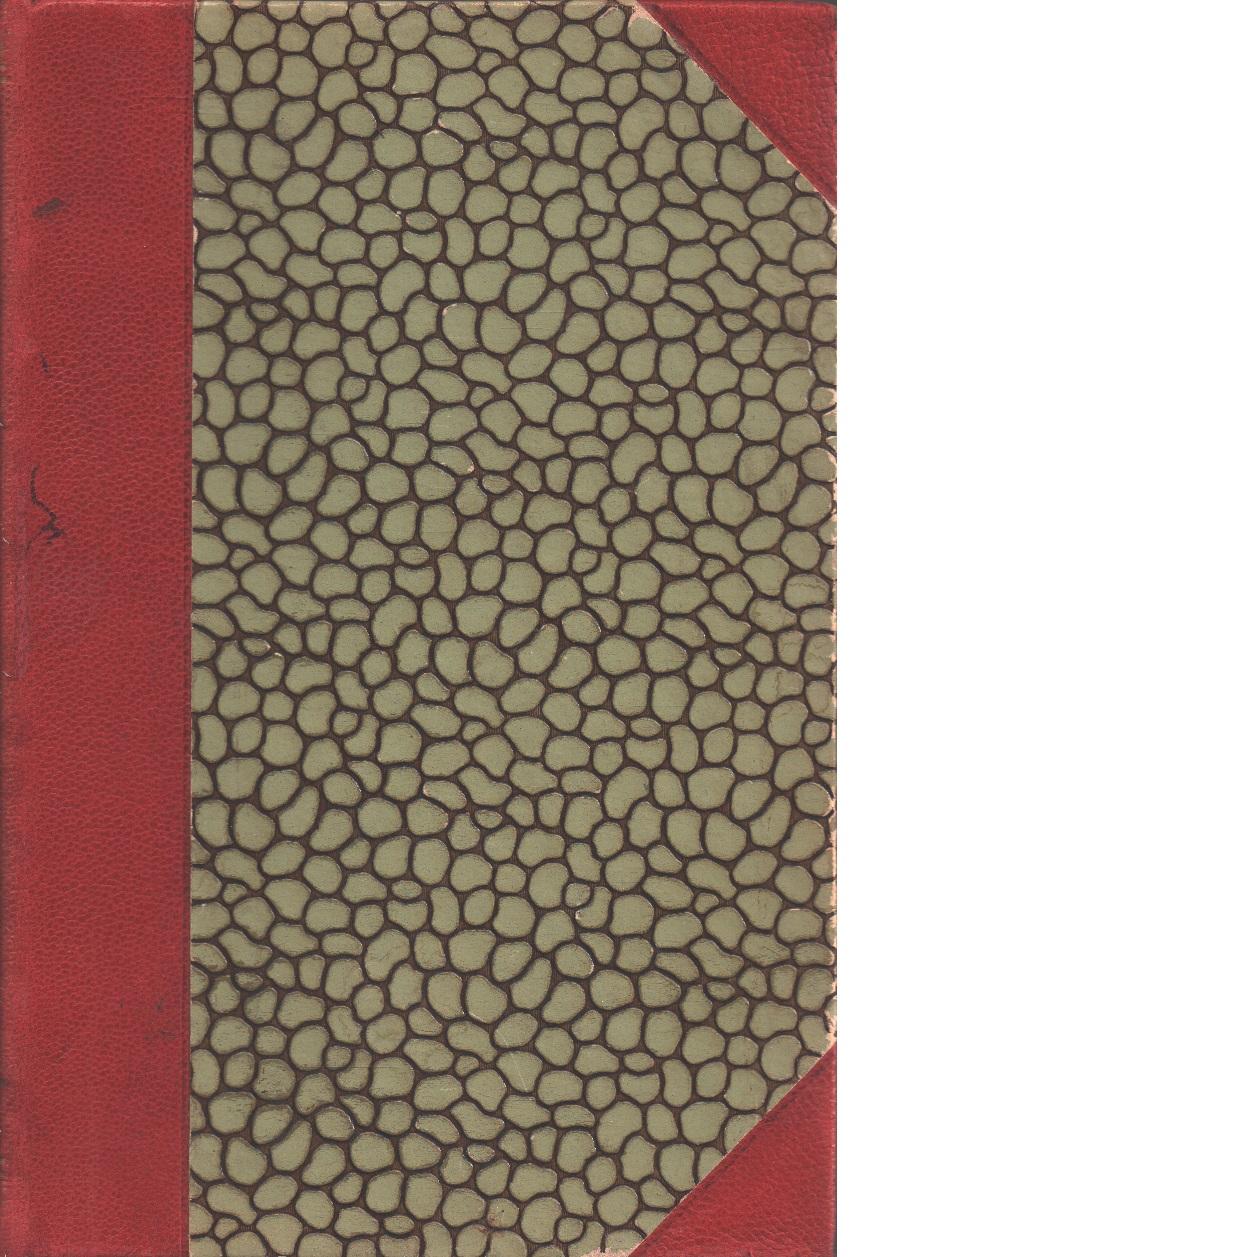 STF:s årsskrift 1915 - Red.